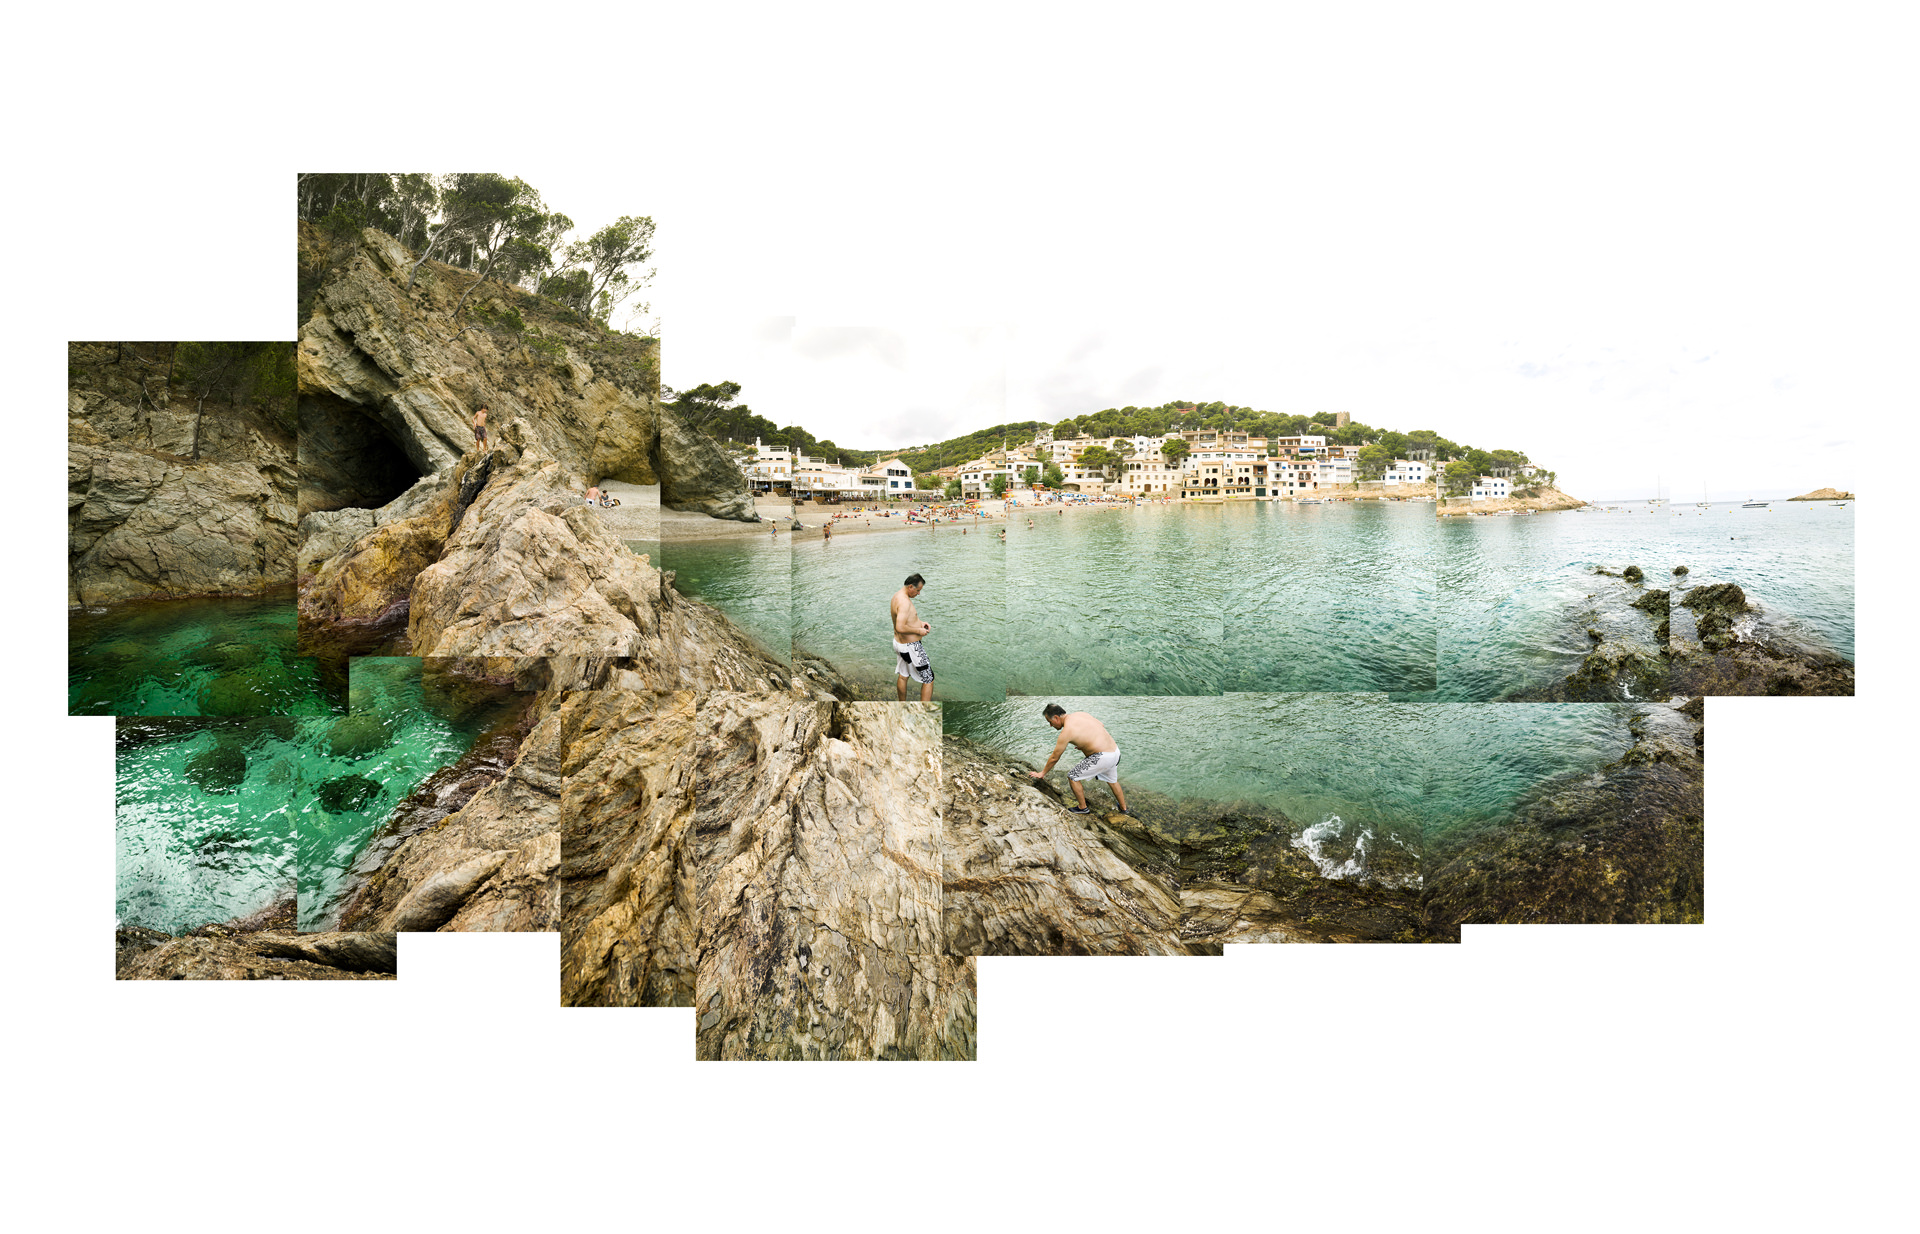 ©ankeluckmann645, ADAC, Reisemagazin, beach, spain, costa brava, people, landscape